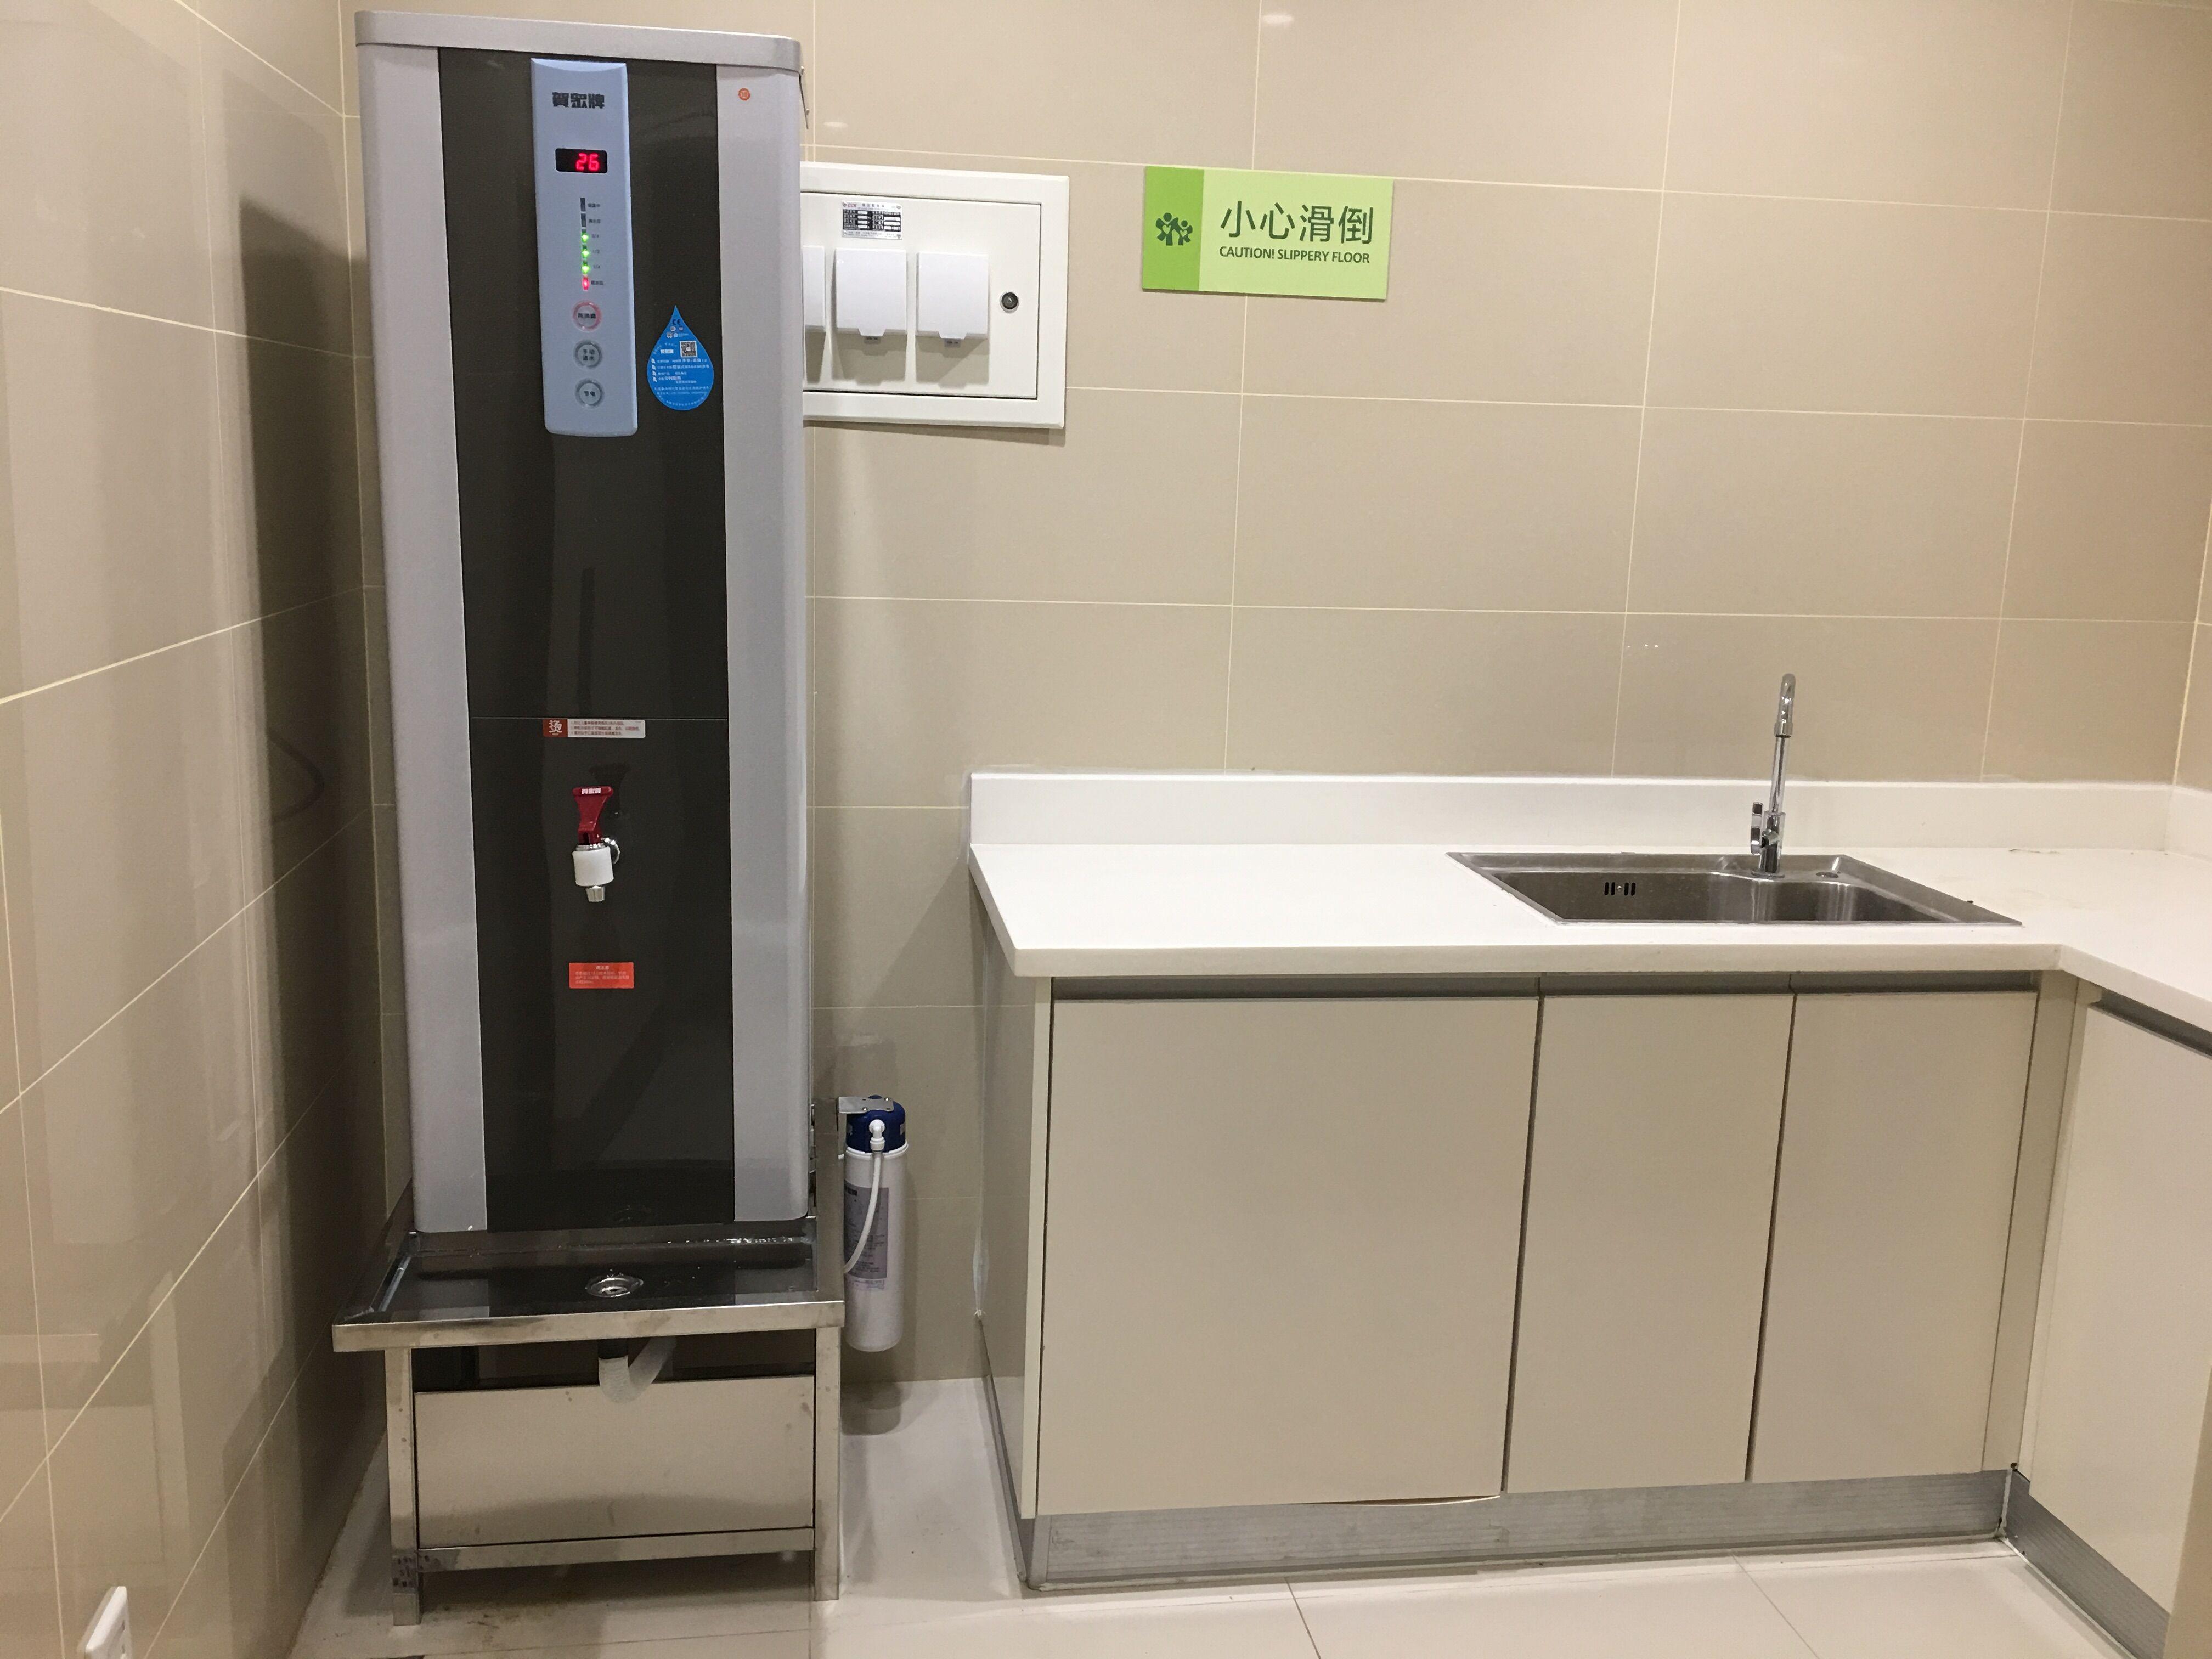 Betway必威_betway必威app牌直饮机开水器入驻华西第二医院锦江院区